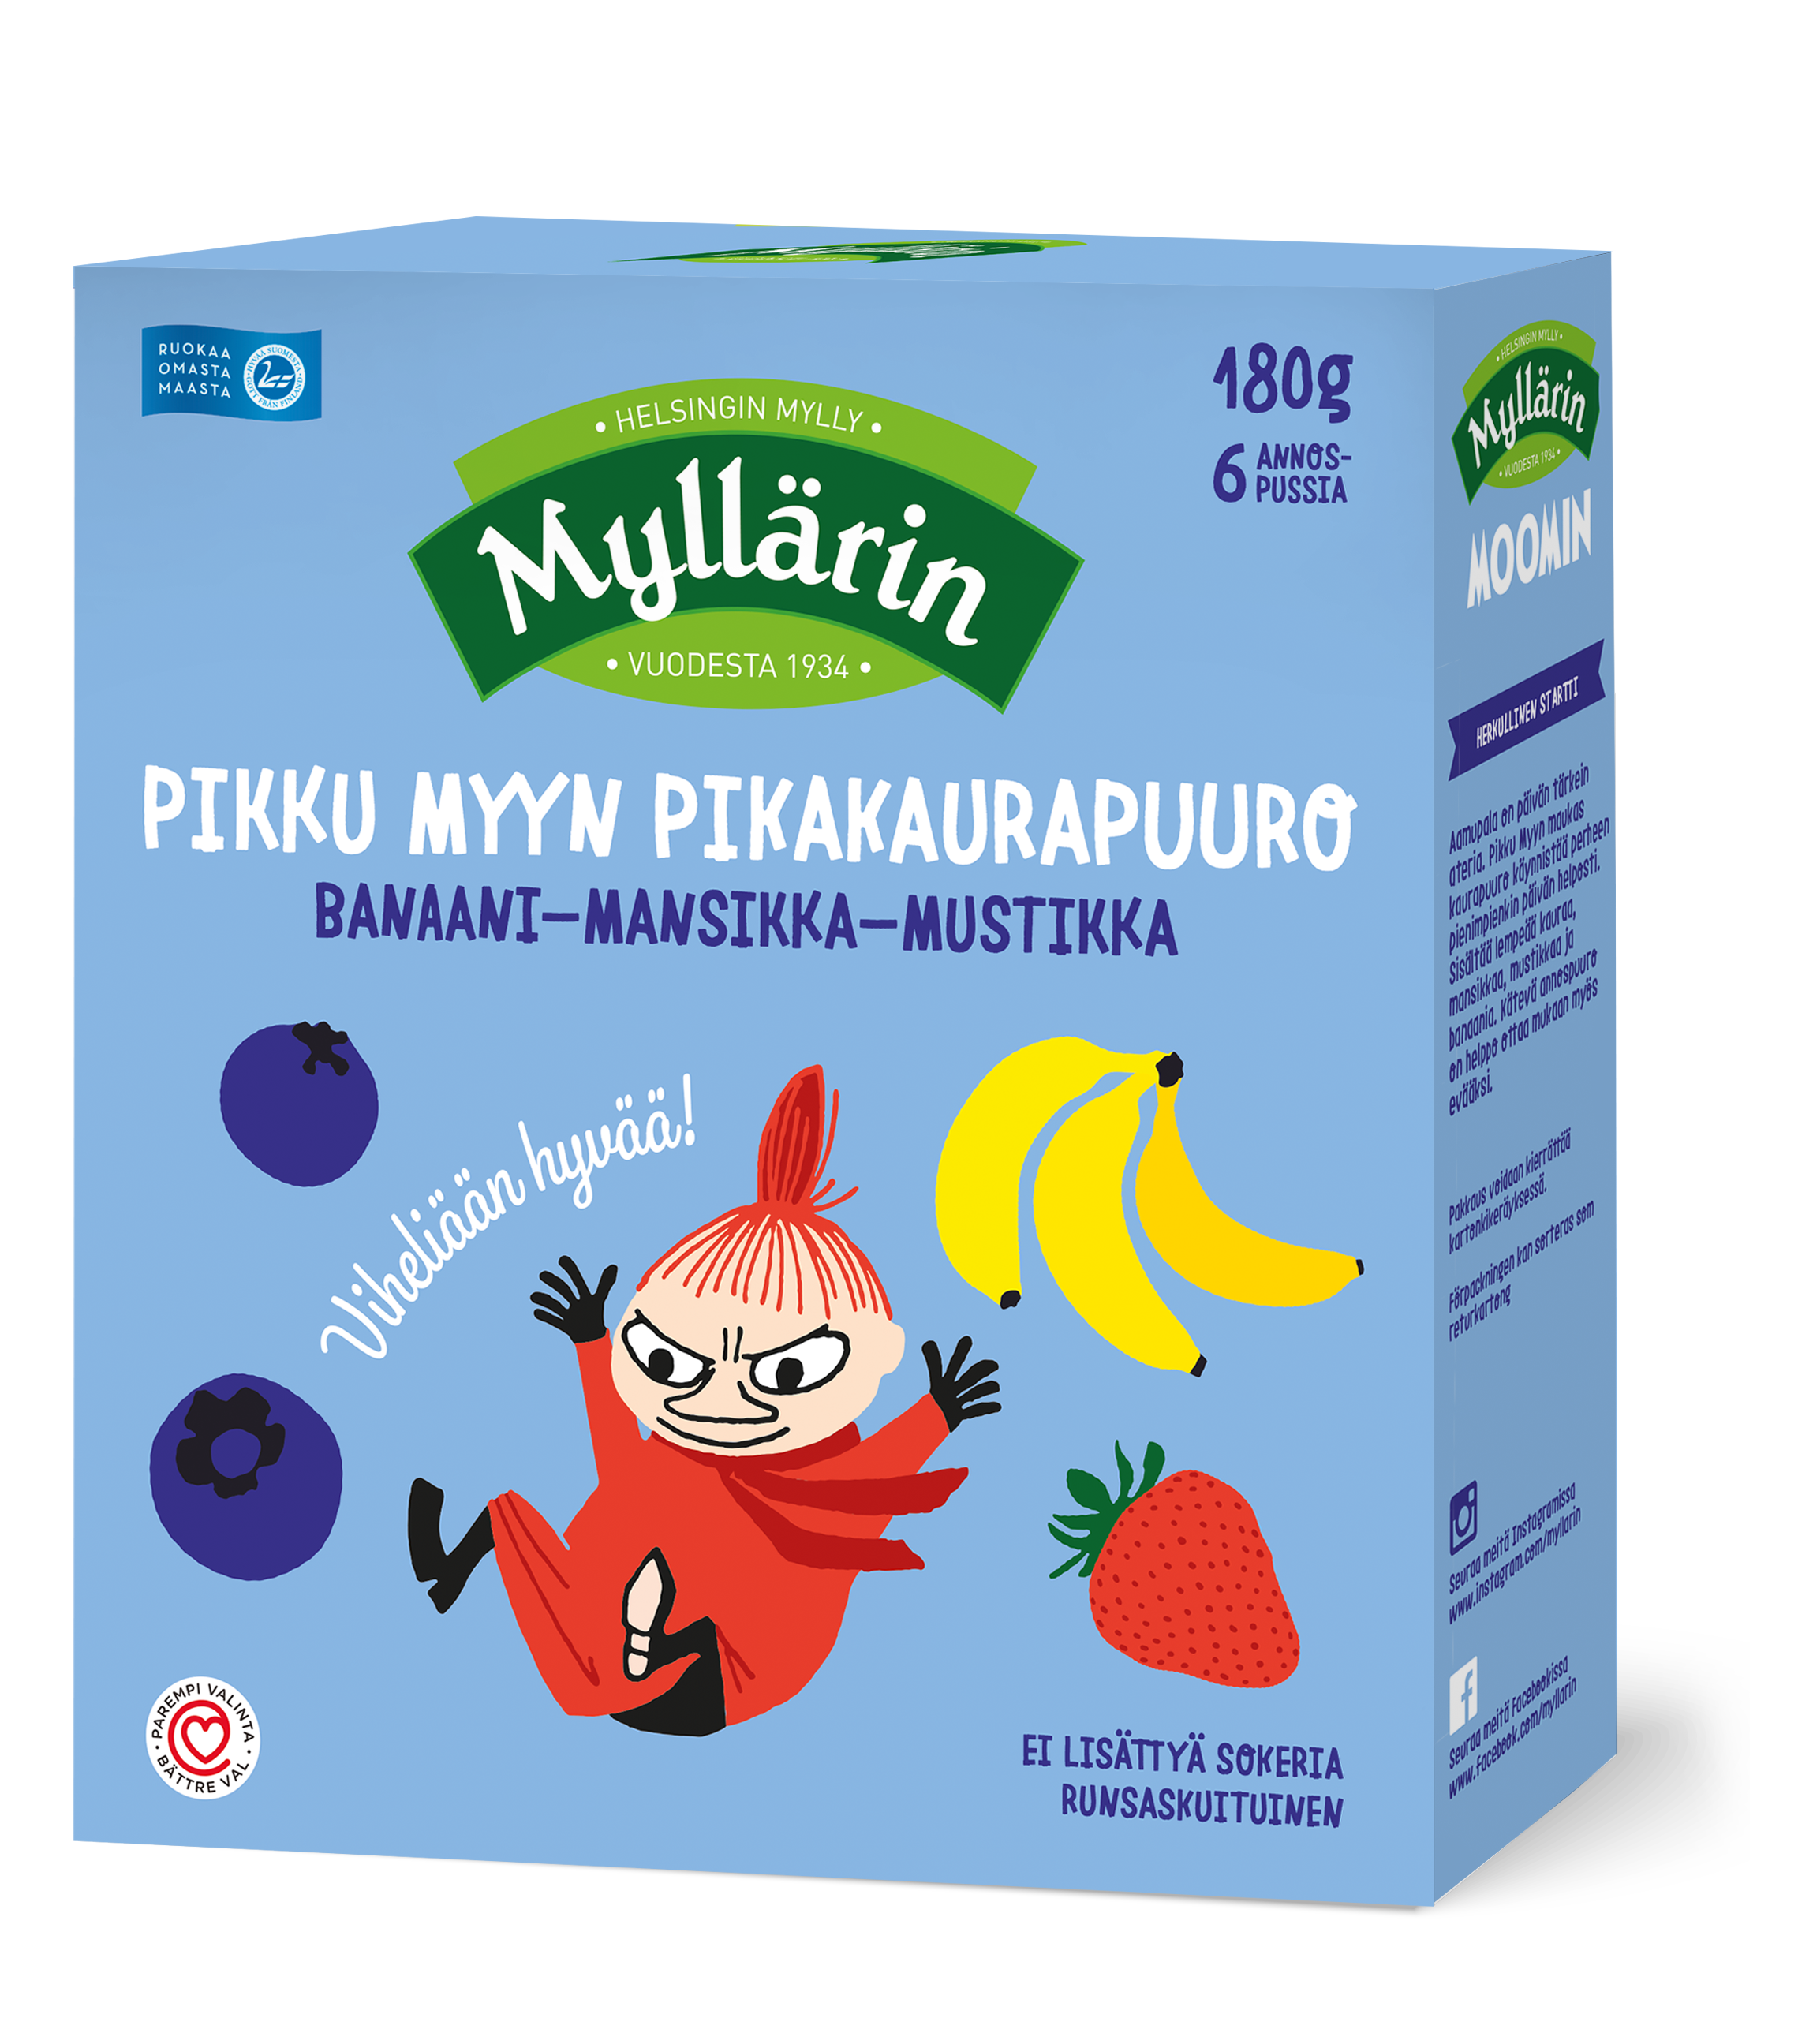 Myllarin Little My's Instant Oat Porridge Banana-Strawberry-Blueberry 6 x 30 g